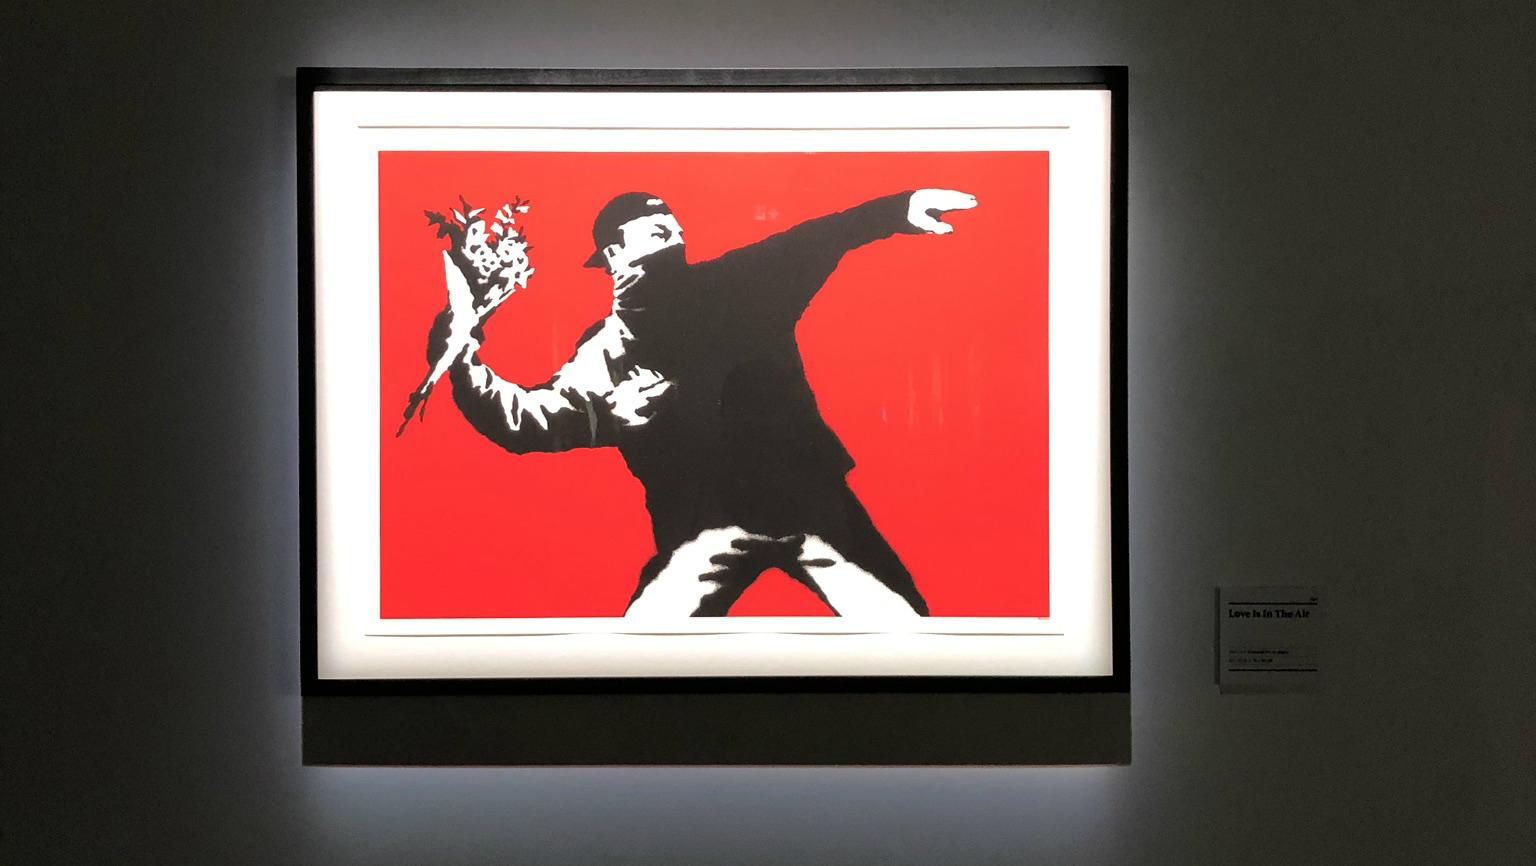 Banksy would definitely hate Art Basel's Banksy museum